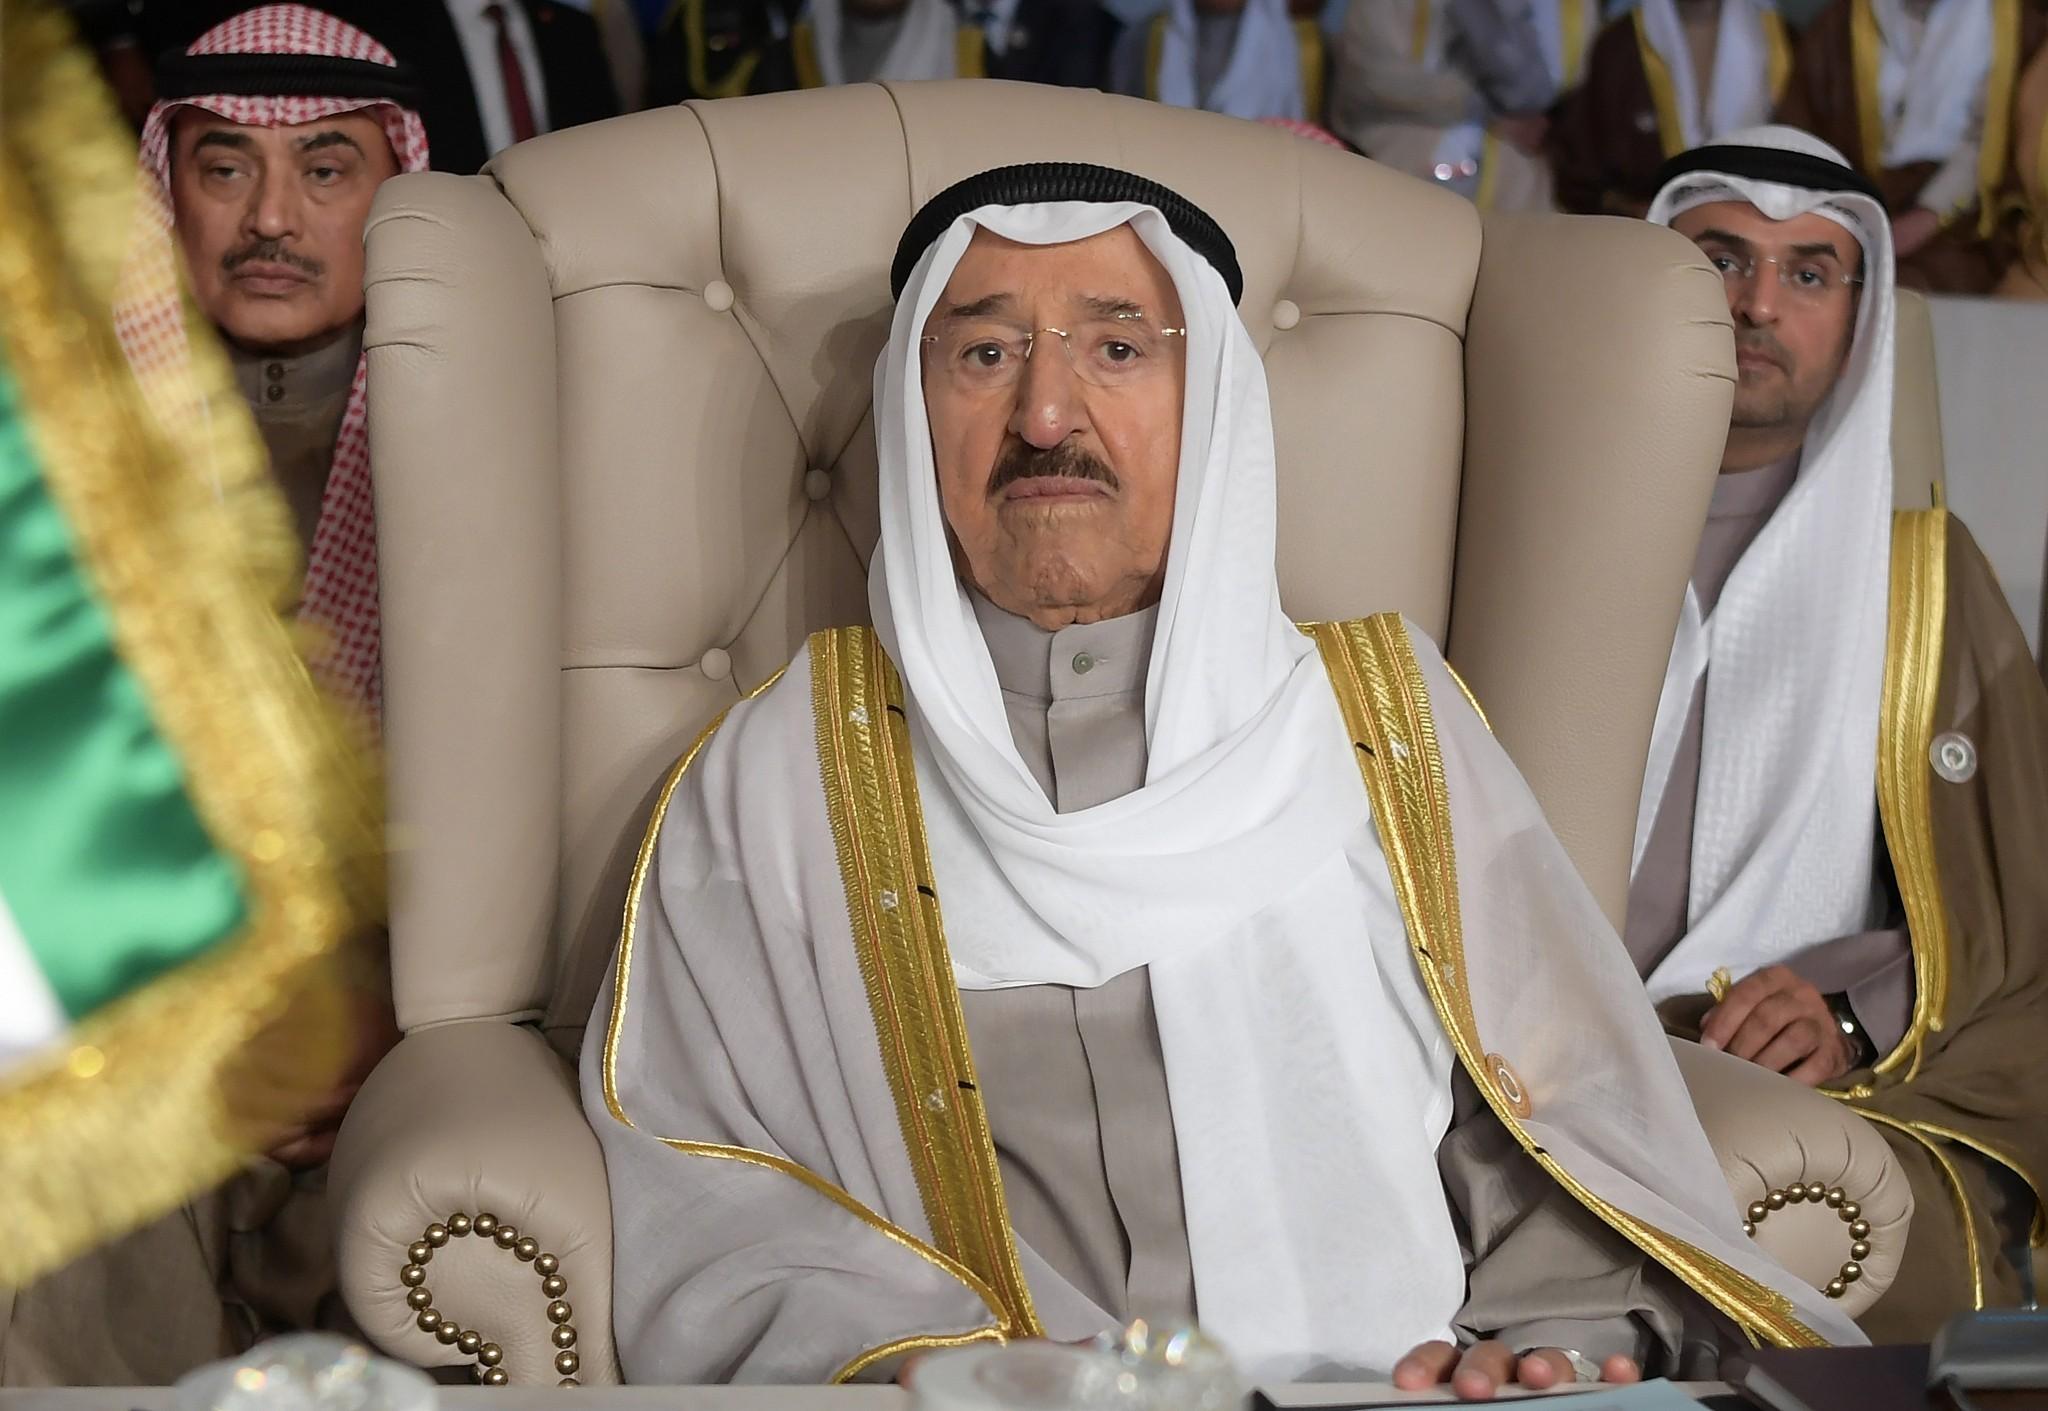 Décès de l'émir Sabah al-Ahmed al-Jabir — Koweït